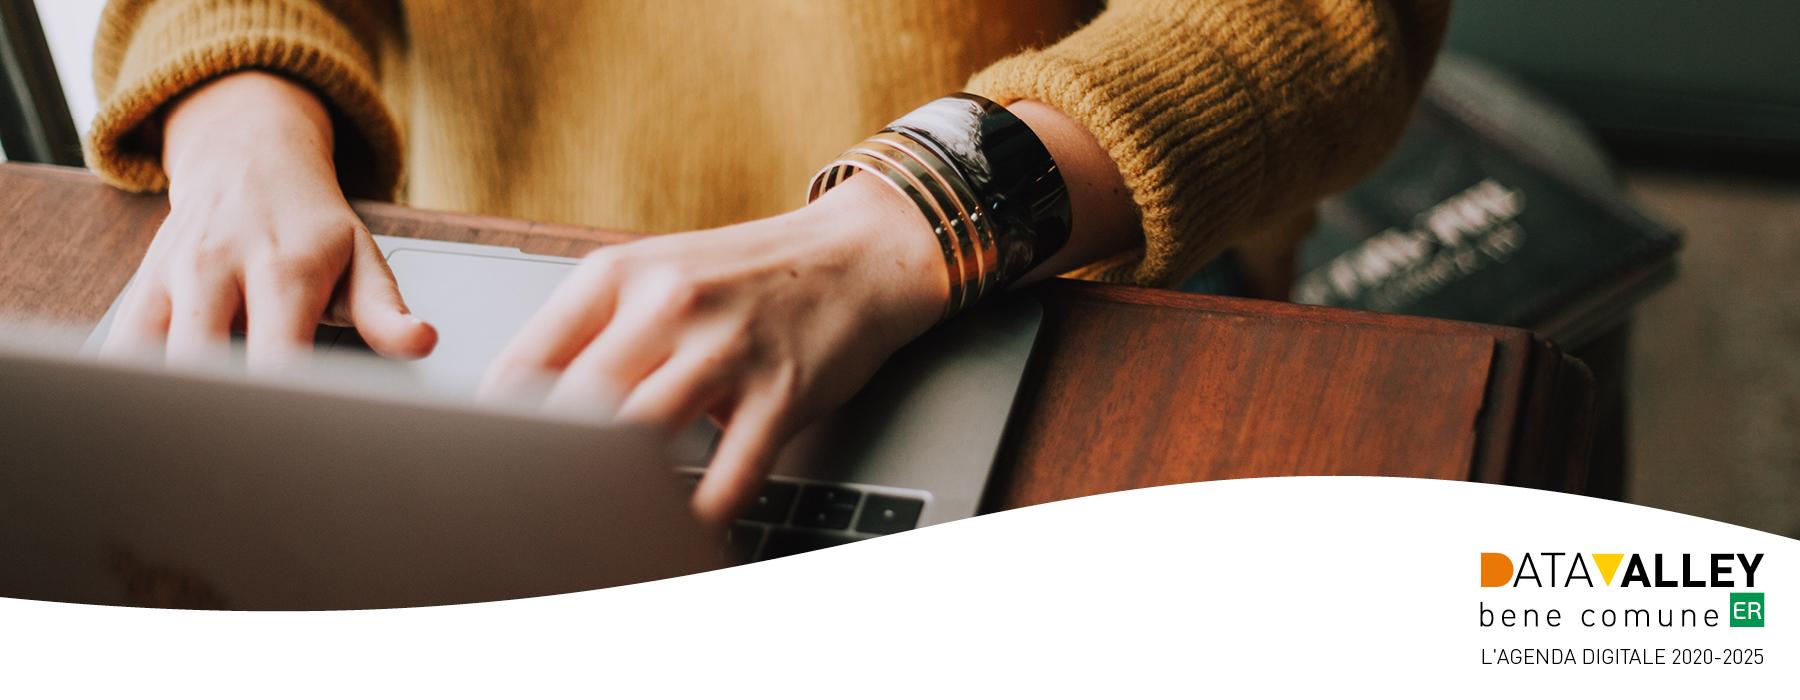 una ragazza usa un laptop